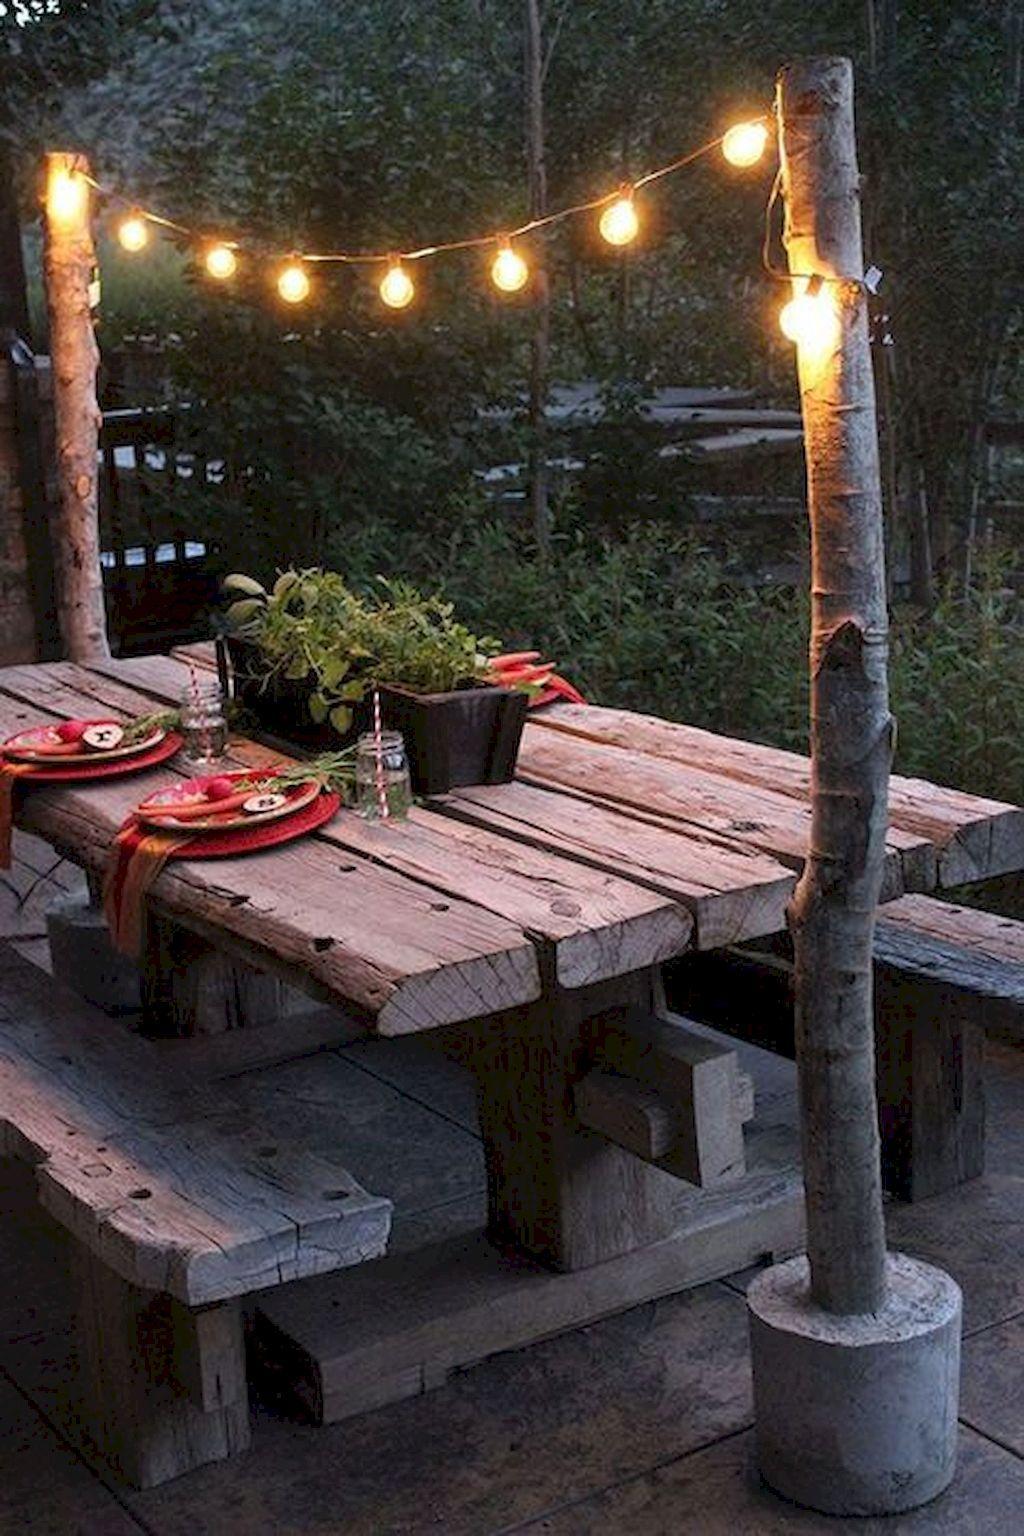 55 Rustic Outdoor Patio Table Design Ideas DIY on a Budget ...